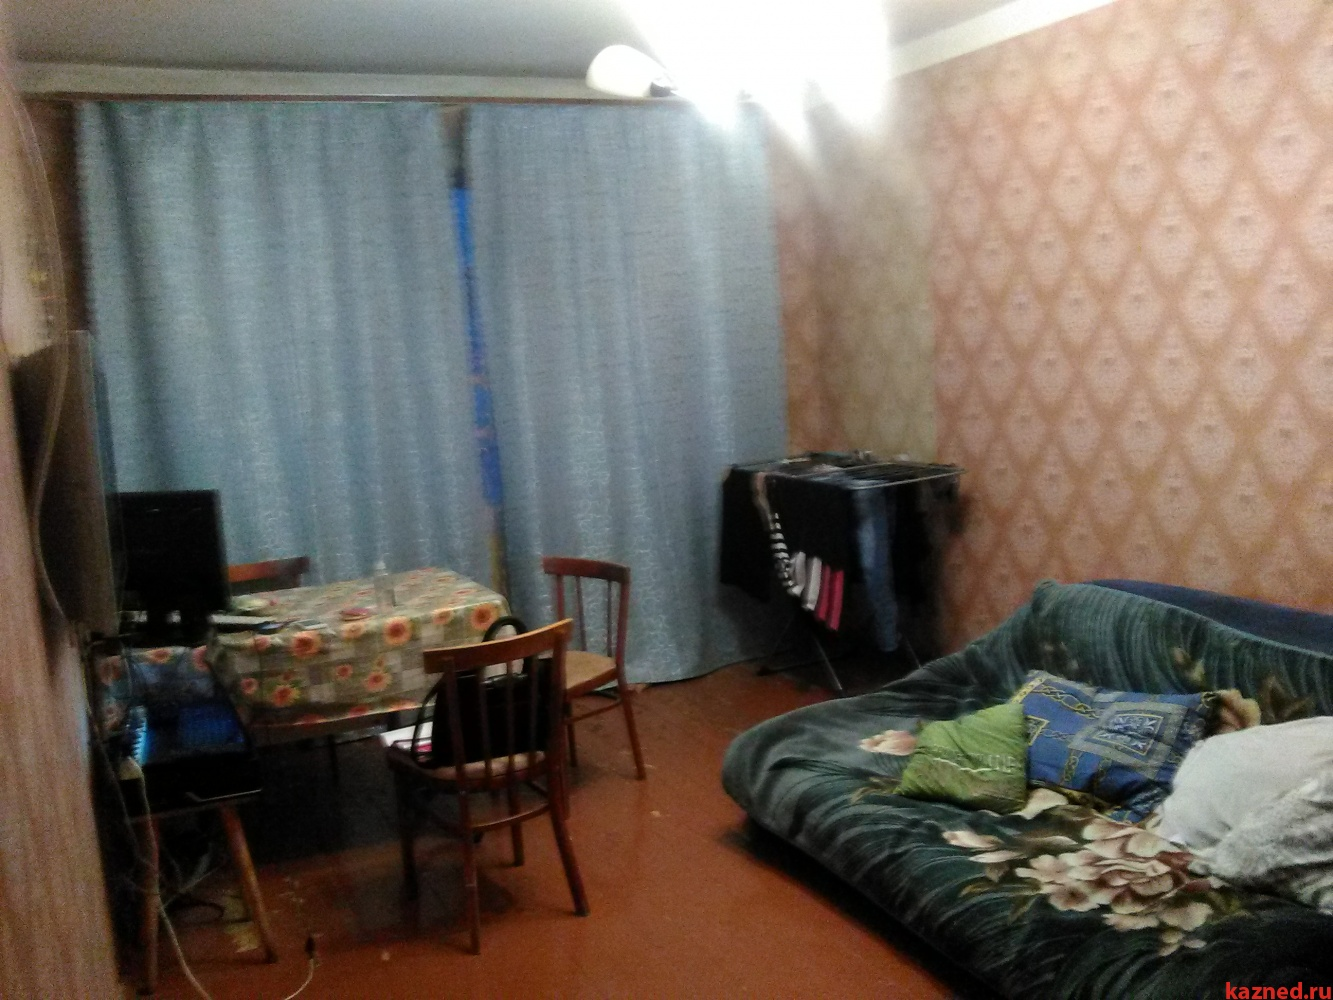 Продажа 2-к квартиры Ямашева,6, 47 м² (миниатюра №1)